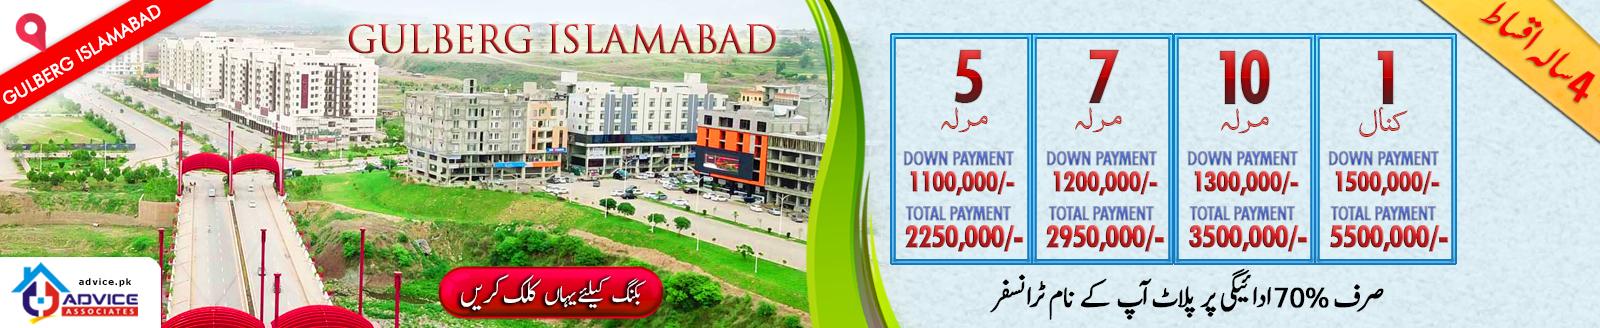 gulberg-islamabad-waleed-banner-new.jpg